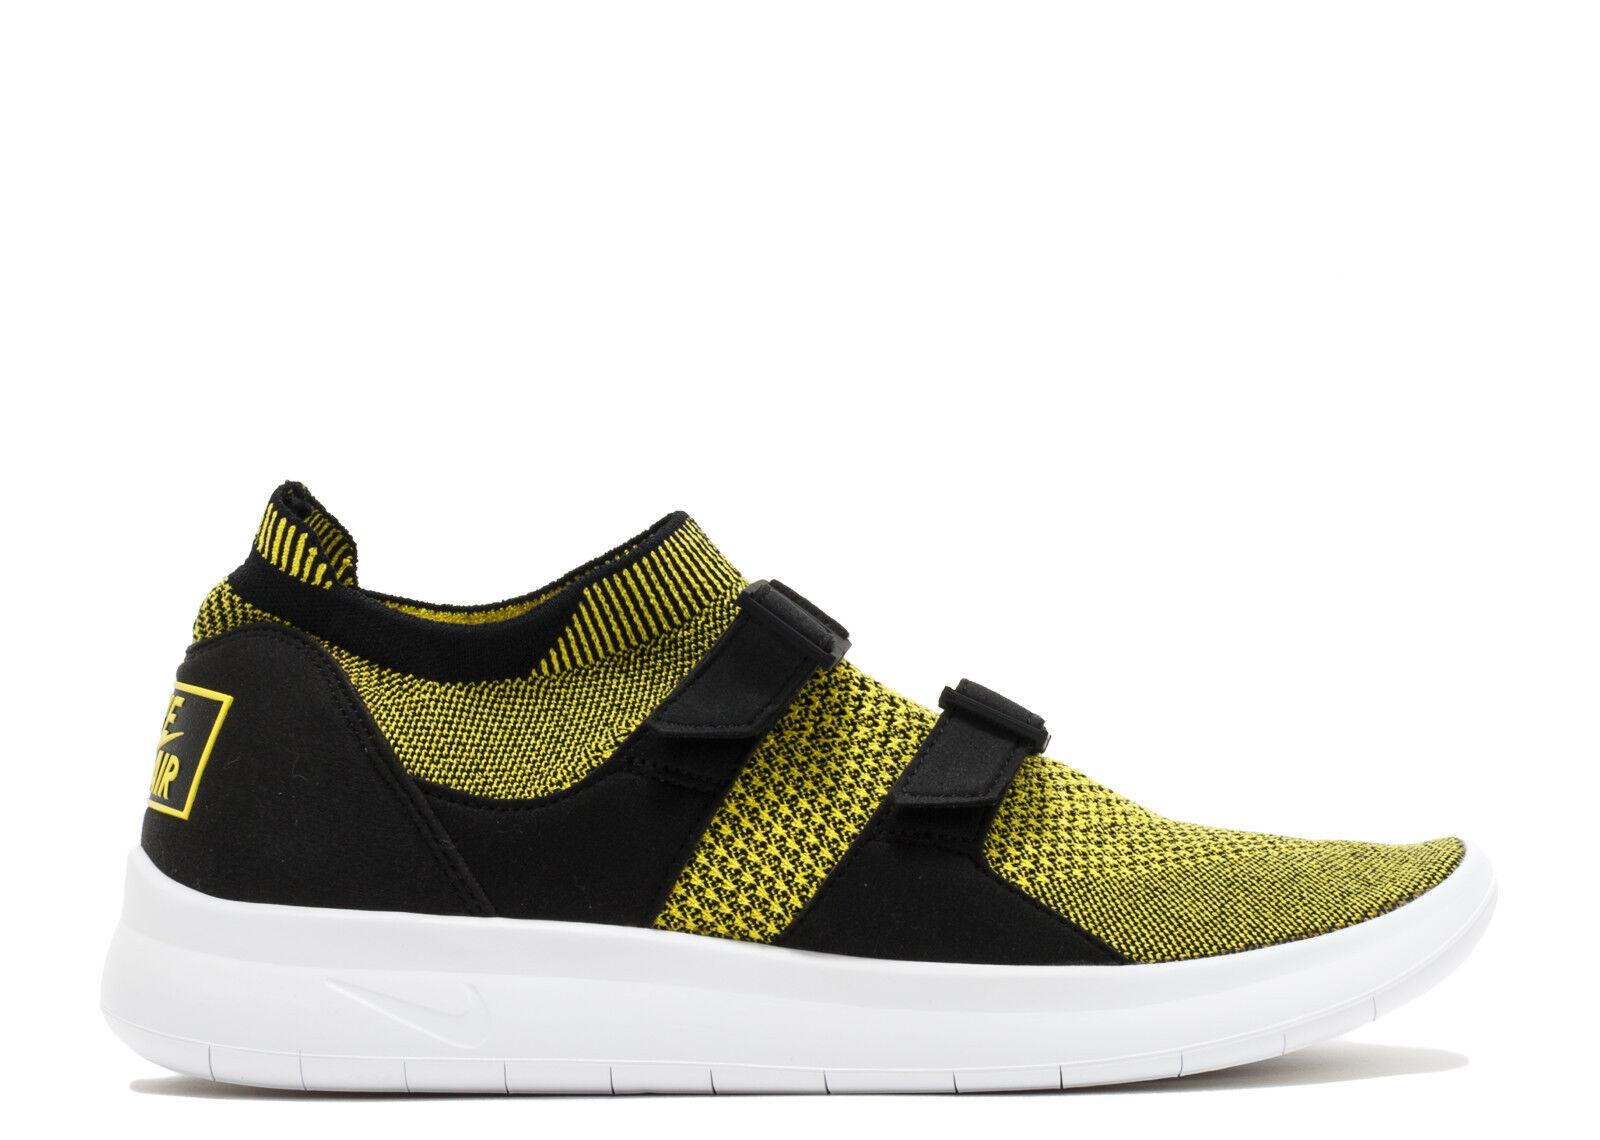 Nike - mens flyknit socke schwarz racer gelben streik / schwarz socke 555433